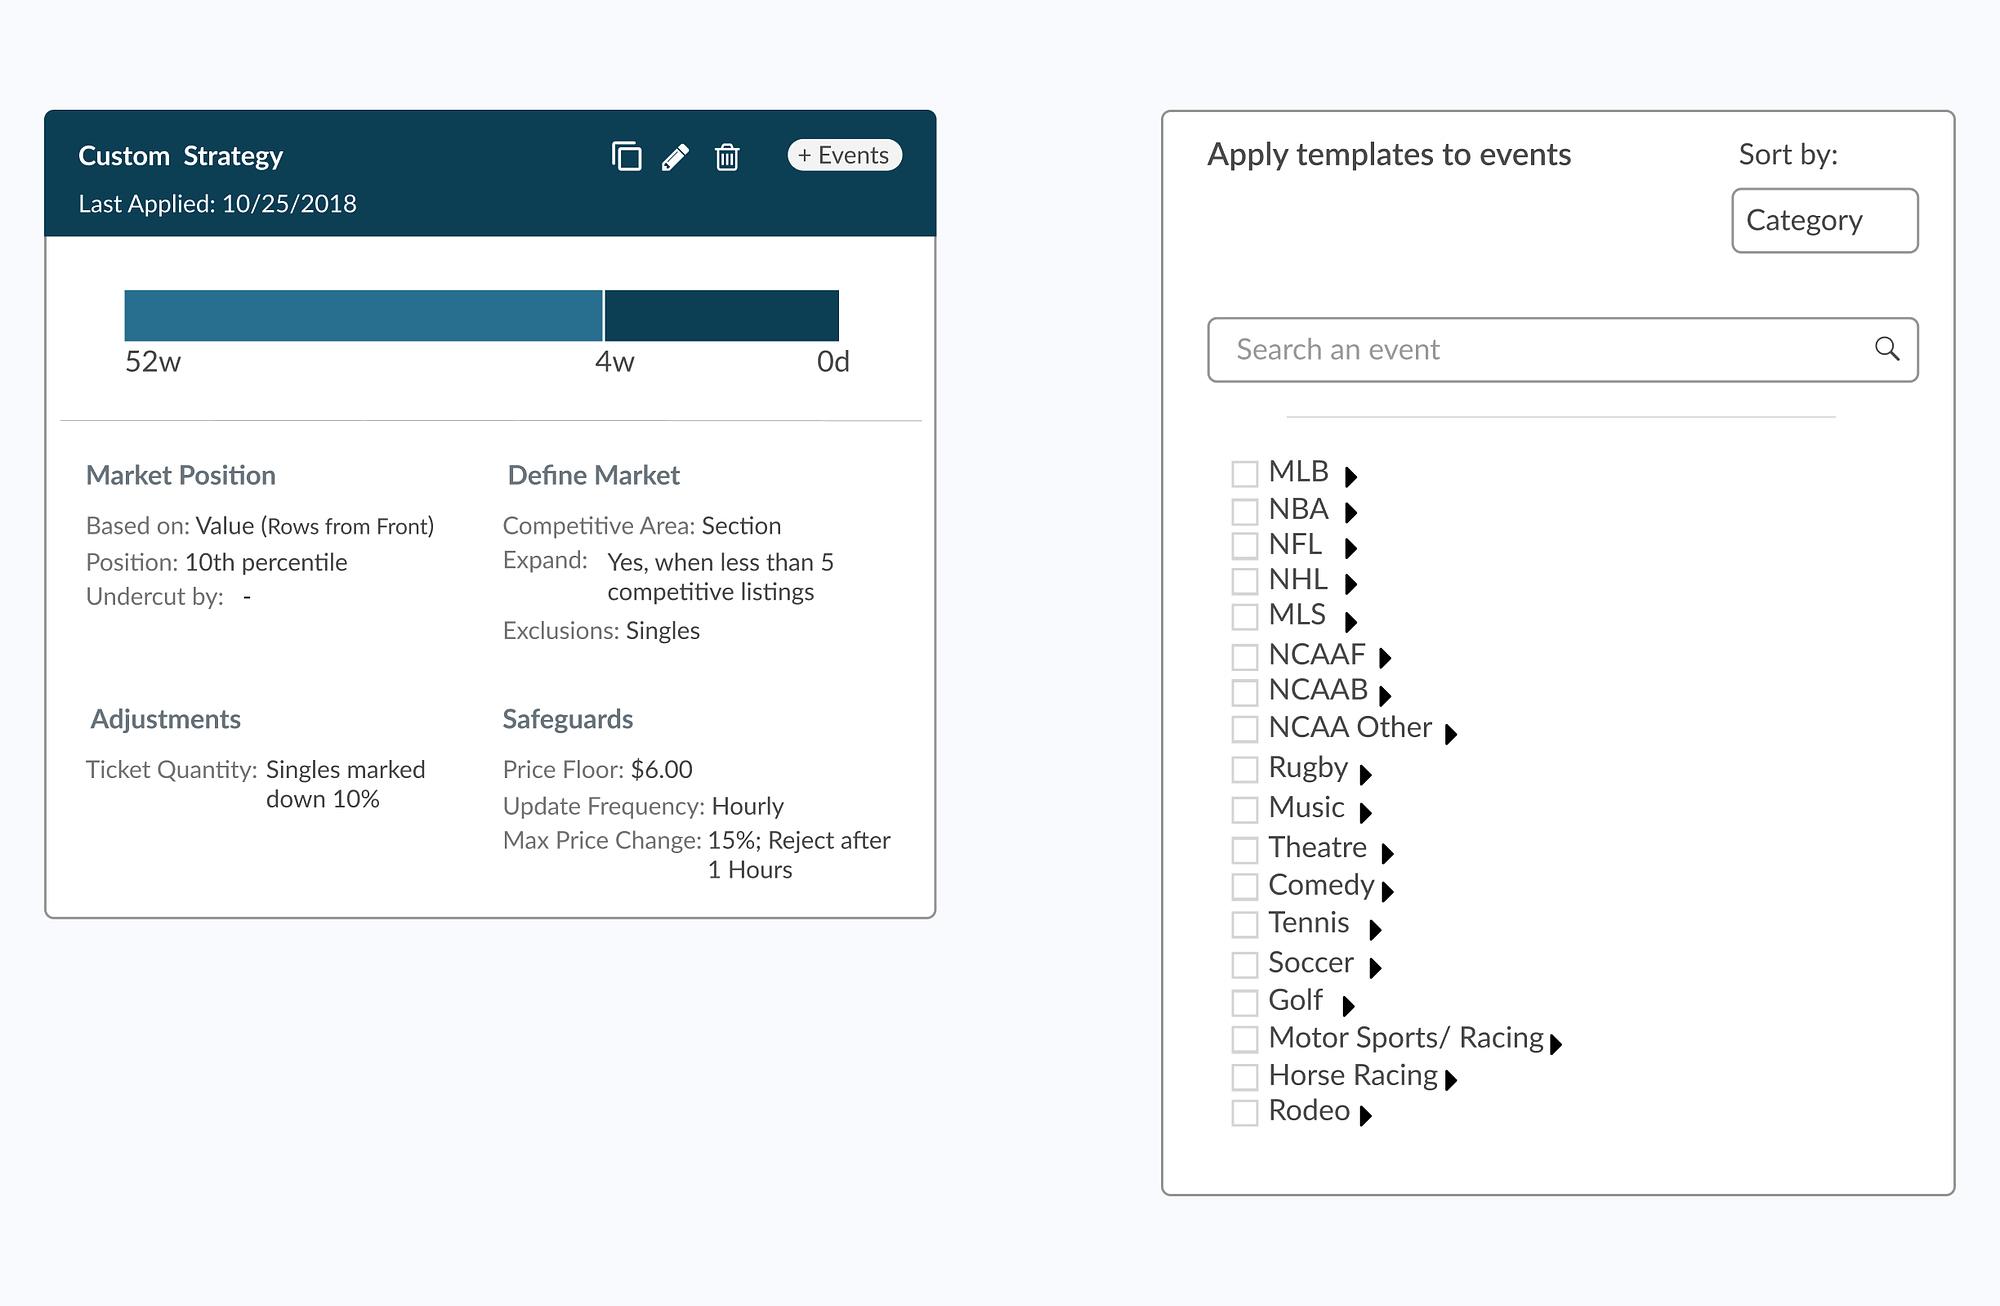 Template-Apply-1